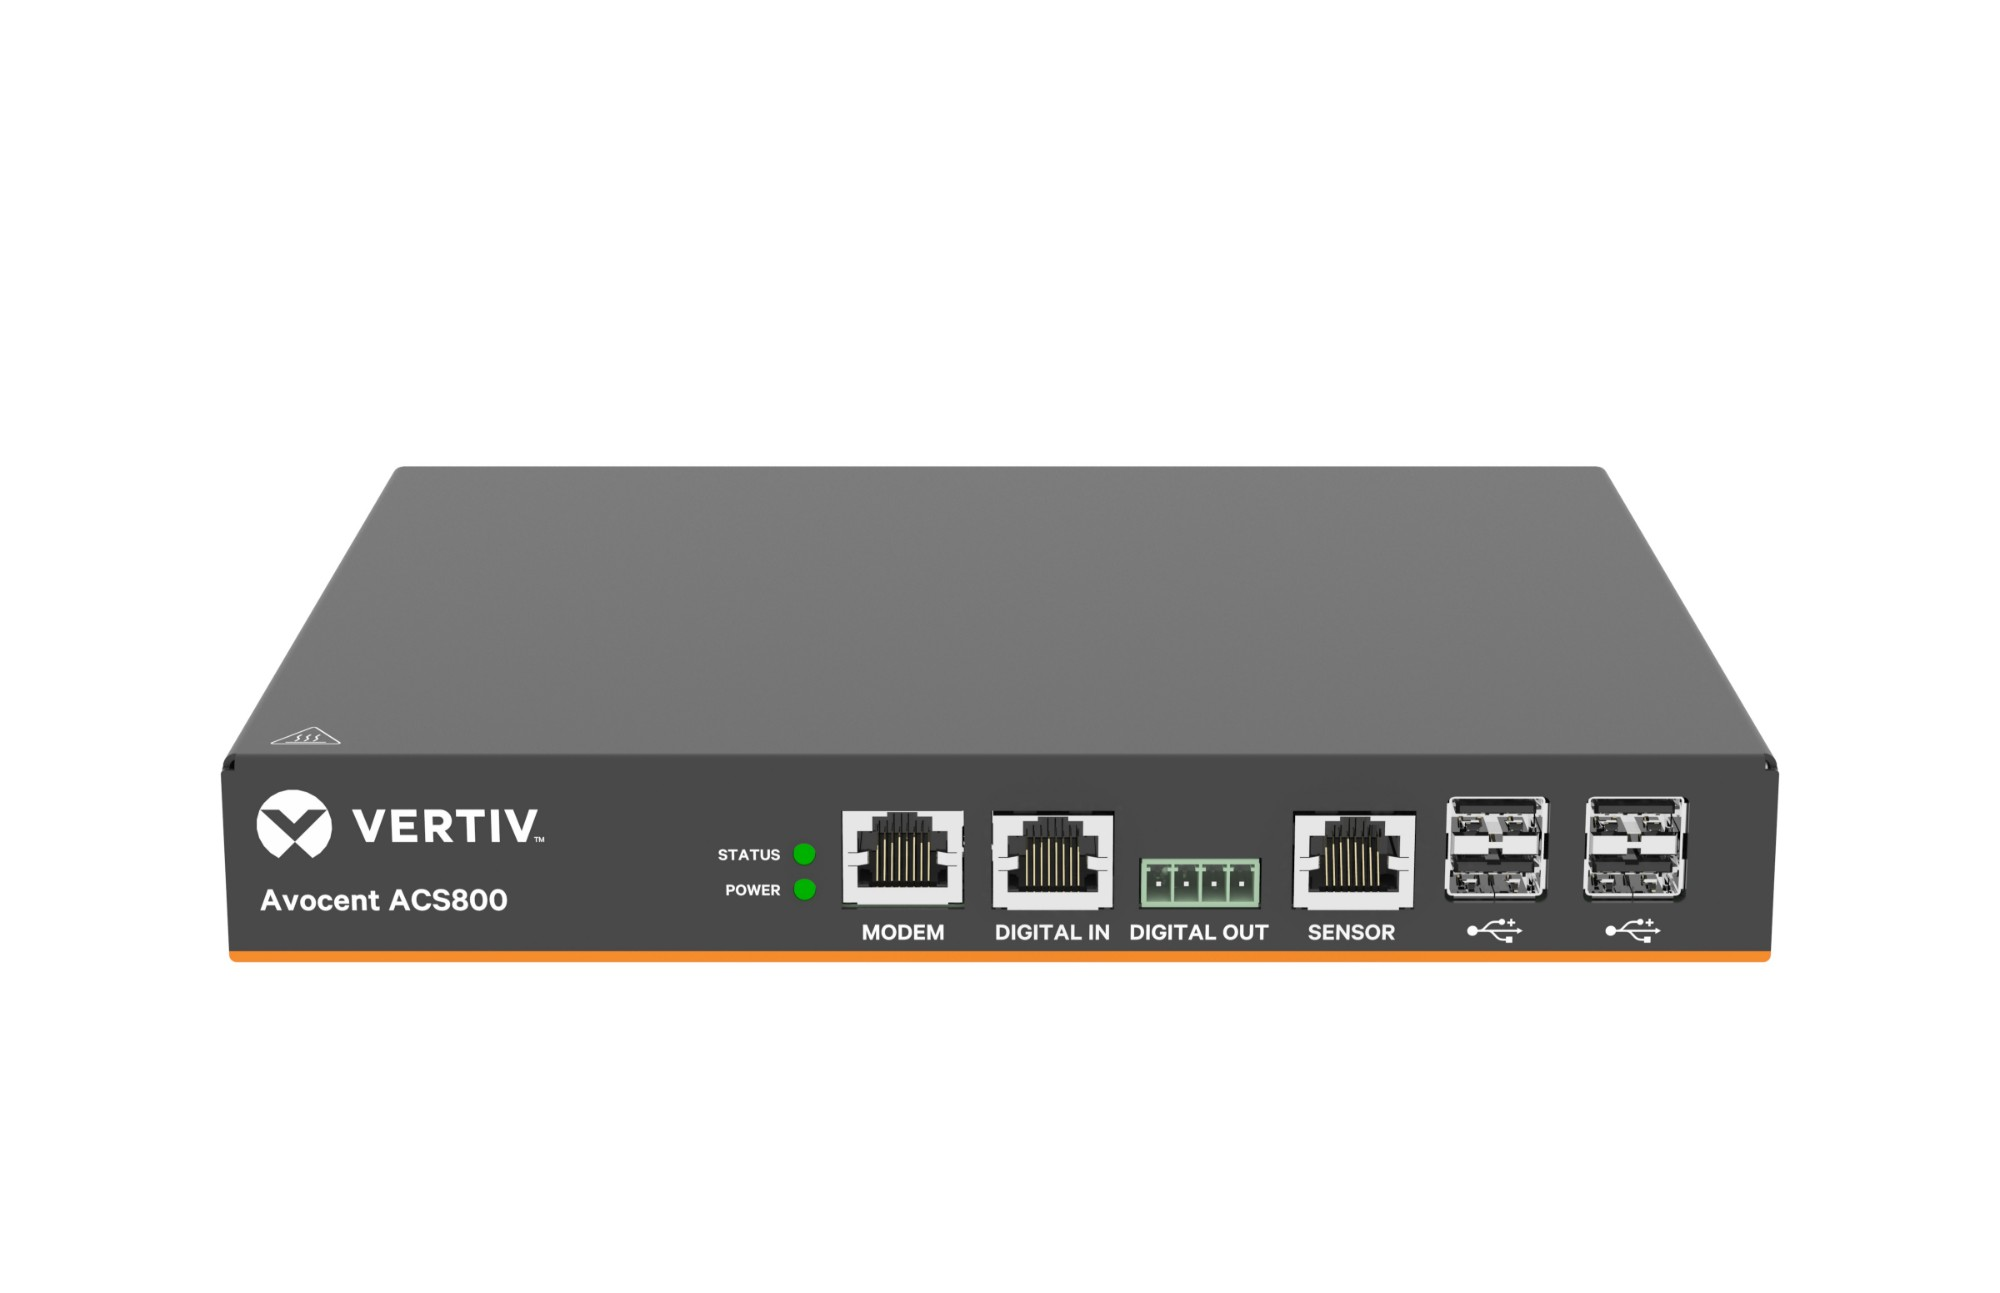 Vertiv Avocent 8-Port ACS800 Serial Console with analog modem, external AC/DC Power Brick -UK power